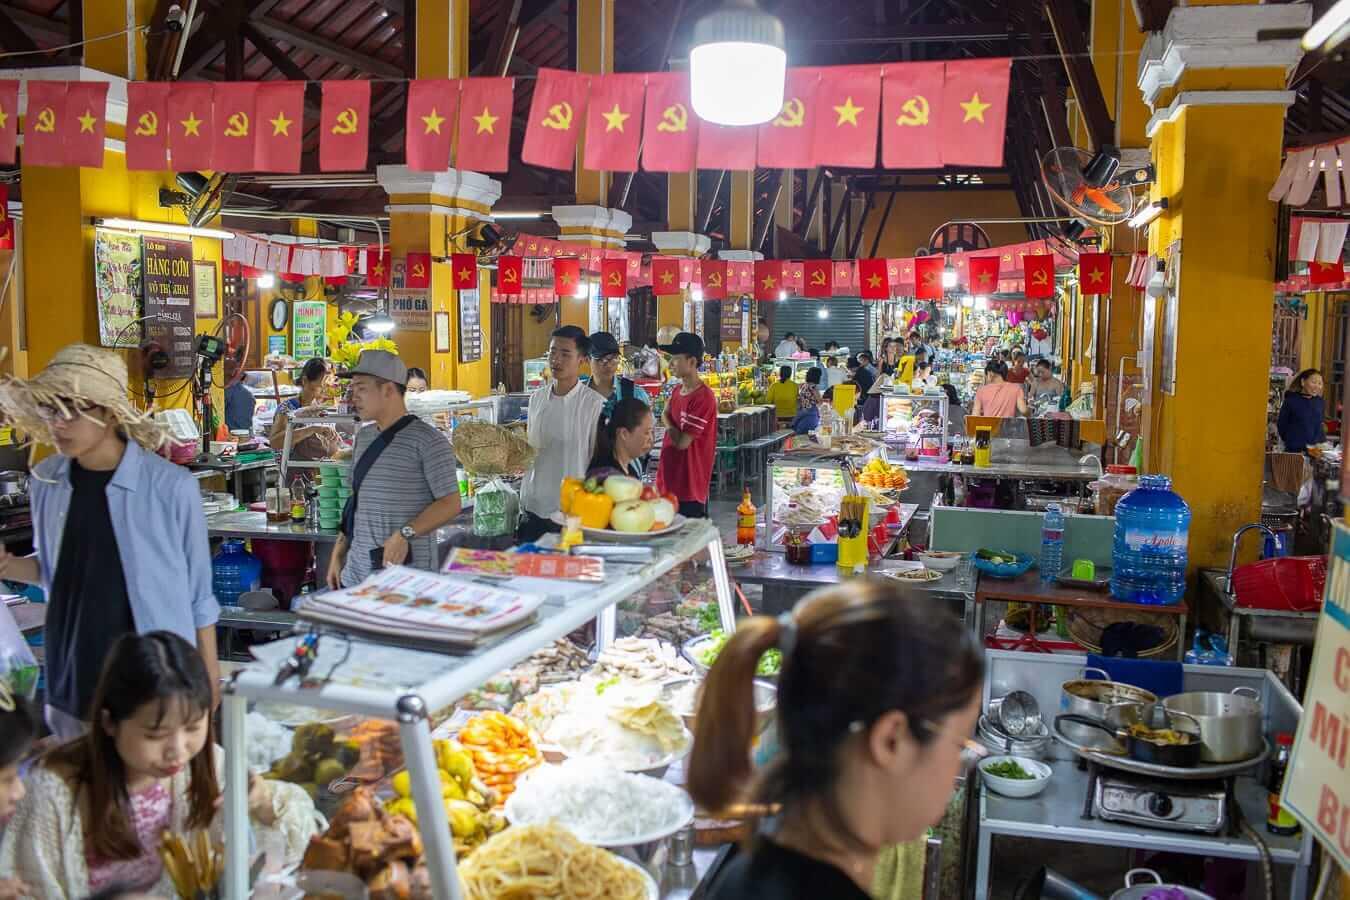 Busy stalls